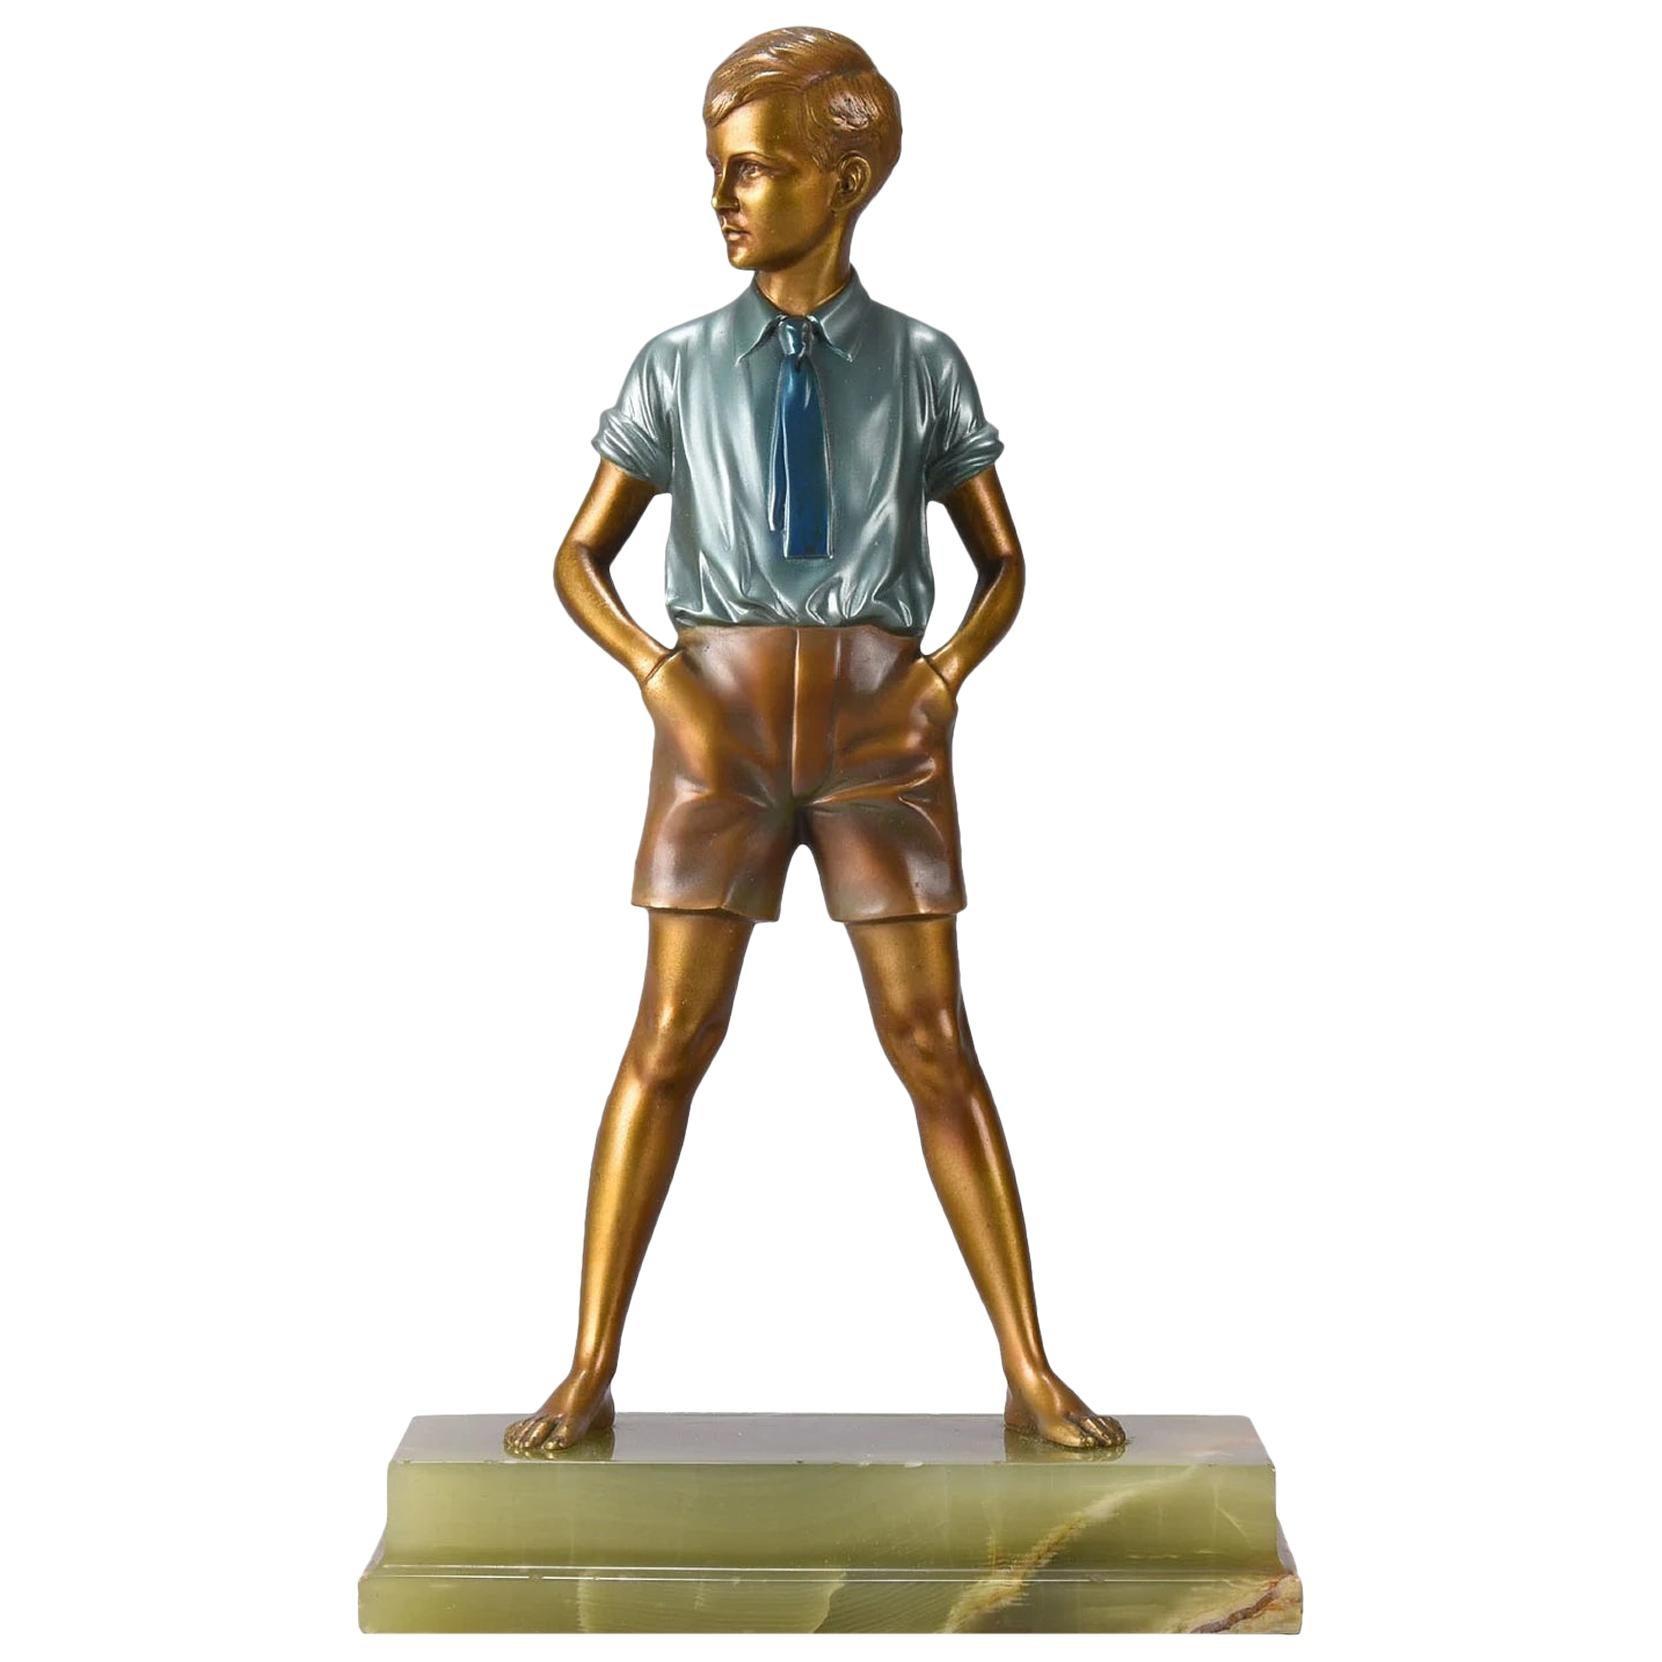 Art Deco Cold Painted Bronze Figure 'Sonny Boy' by Ferdinand Preiss